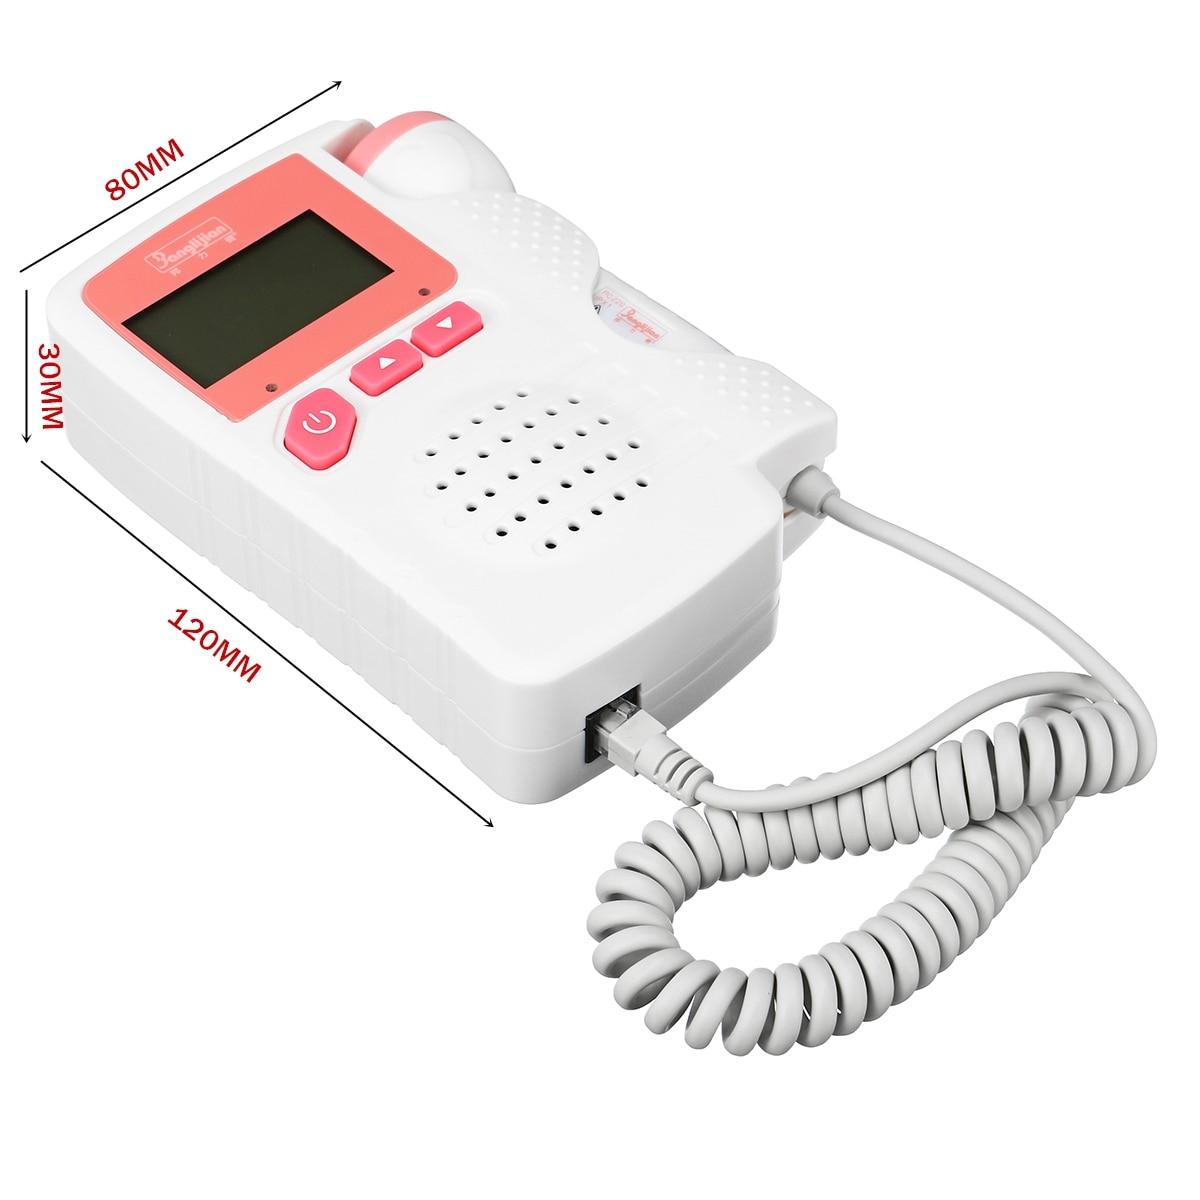 Medidor de Monitores Grávida Fetalpulse 2.0 Mhz Tela